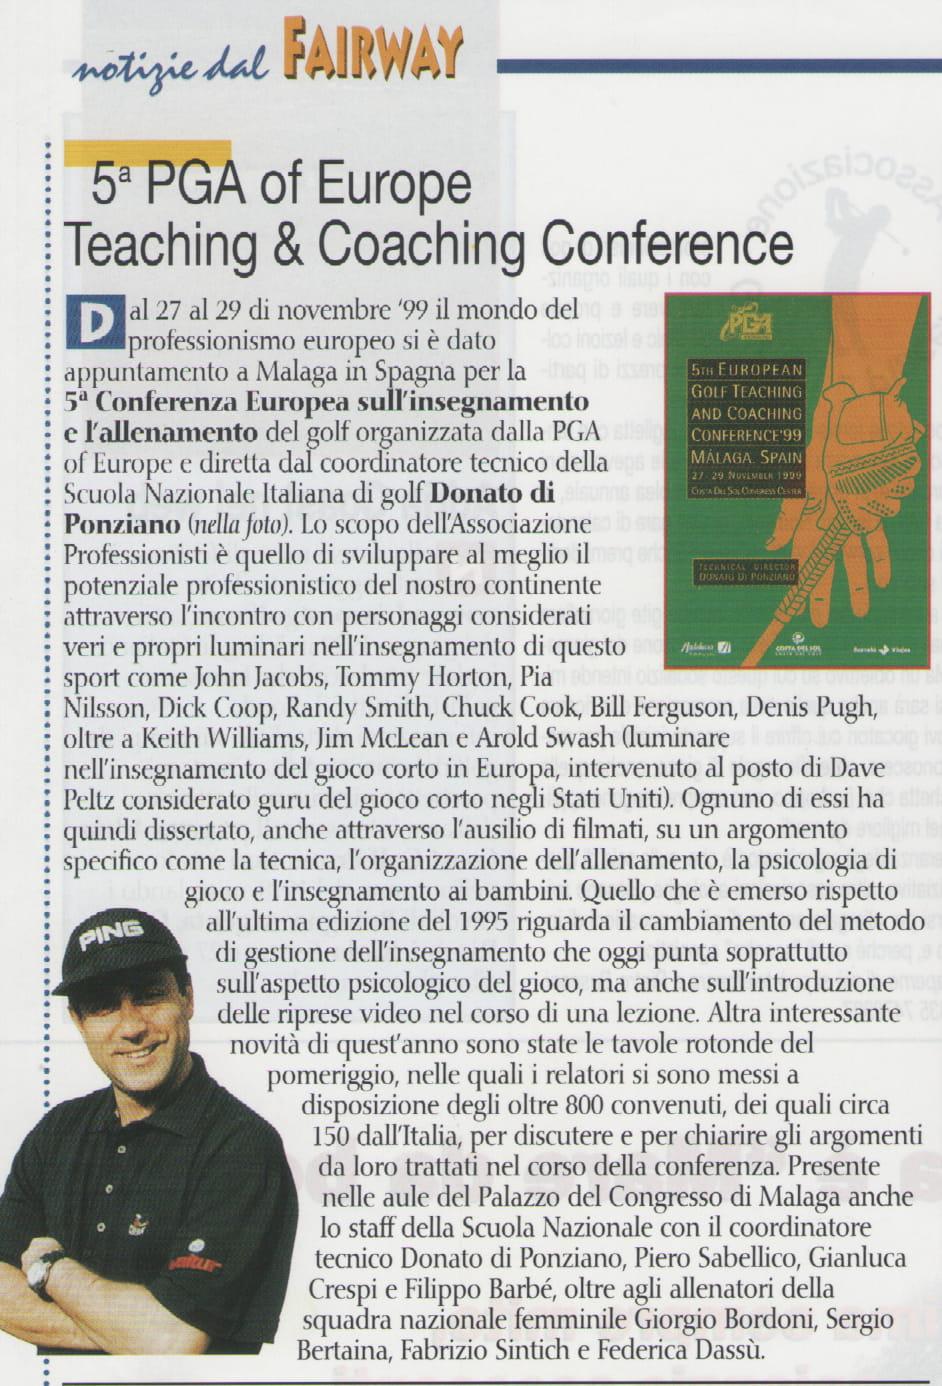 5° PGA of Europe Teaching & Coaching Conference